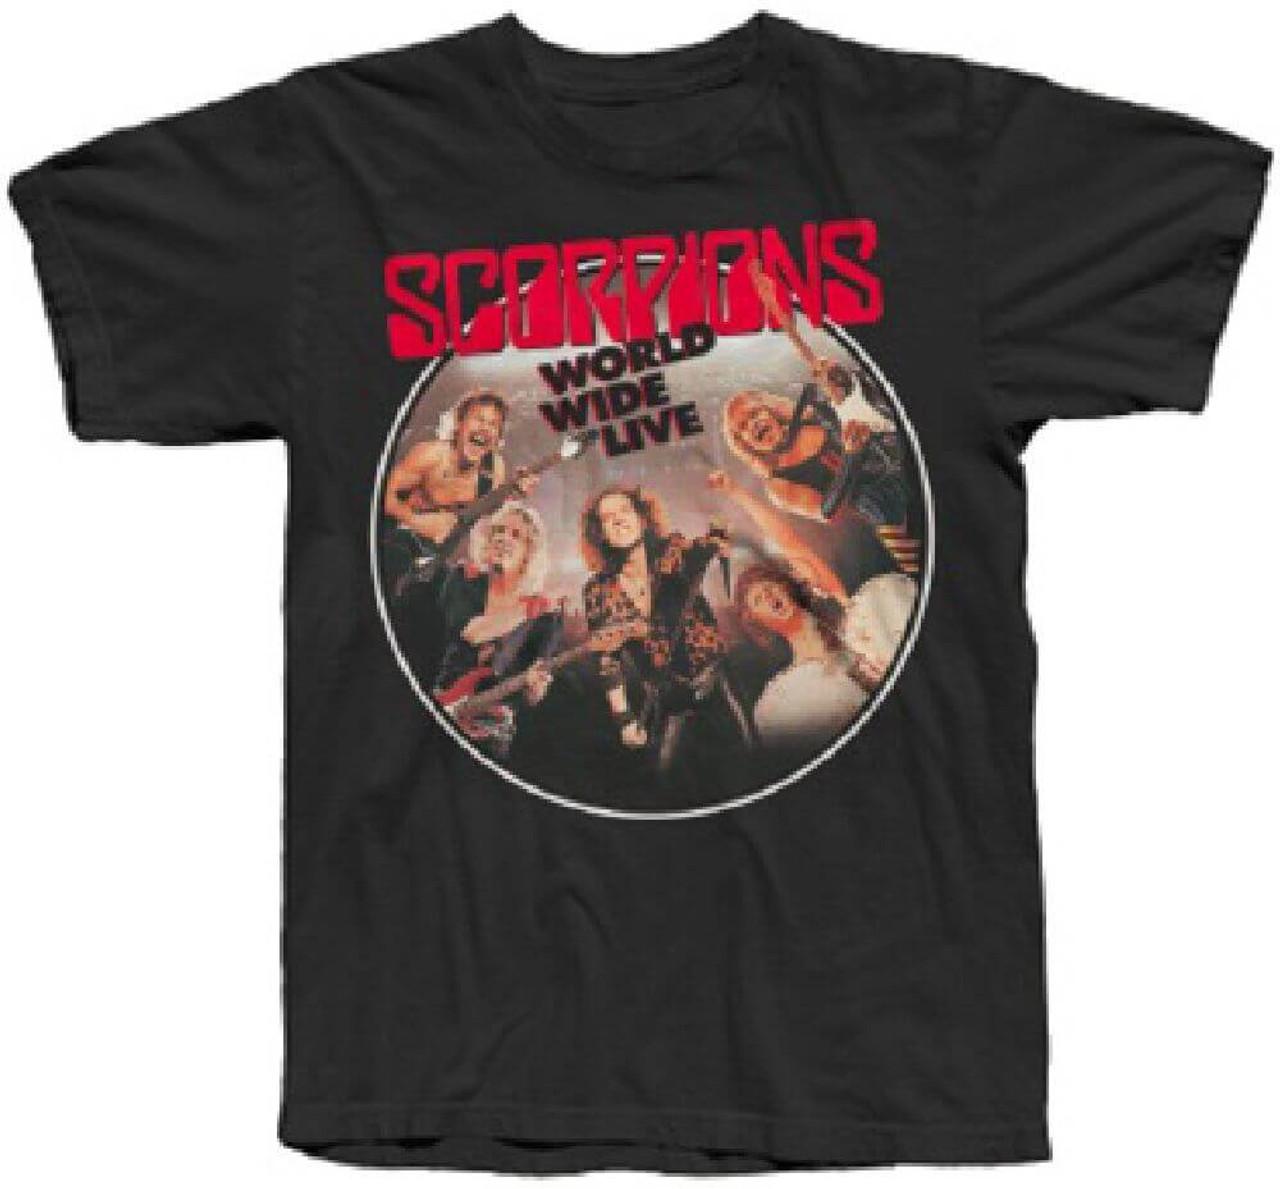 bb25185f Scorpions World Wide Live Album Cover Artwork Men's Black T-shirt